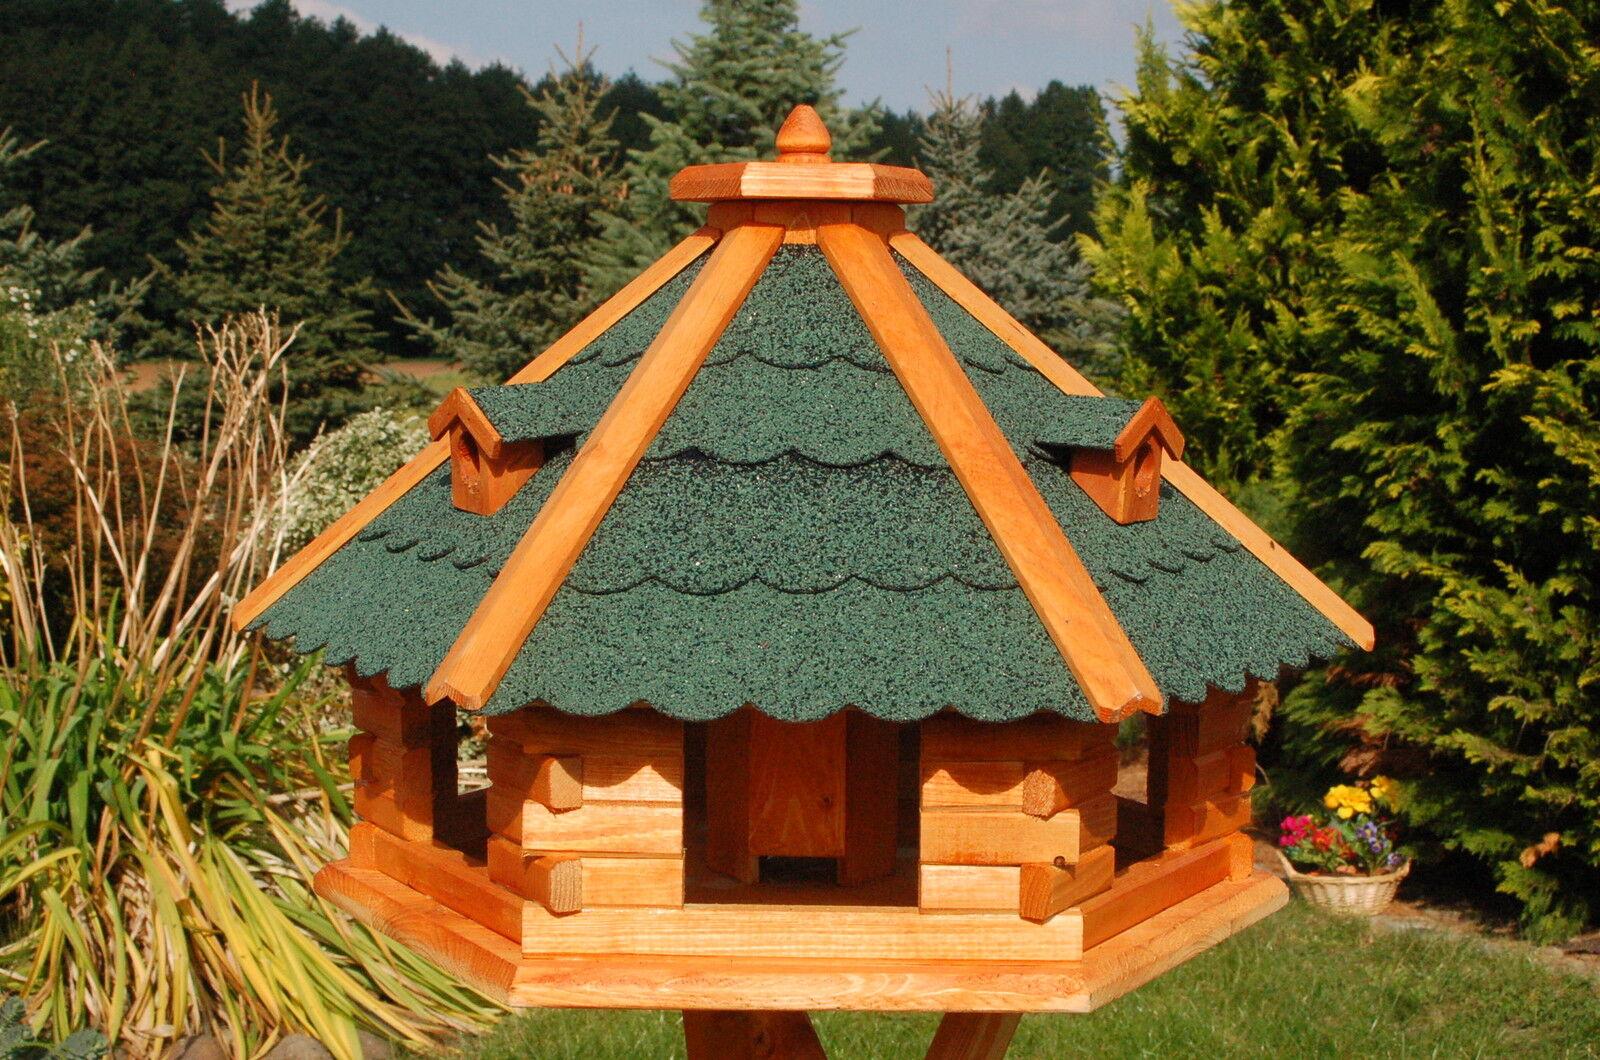 Enorme XXL Casetta uccelli Villa Casa Mangime Uccelli Casetta 67x45 cm tetto verde